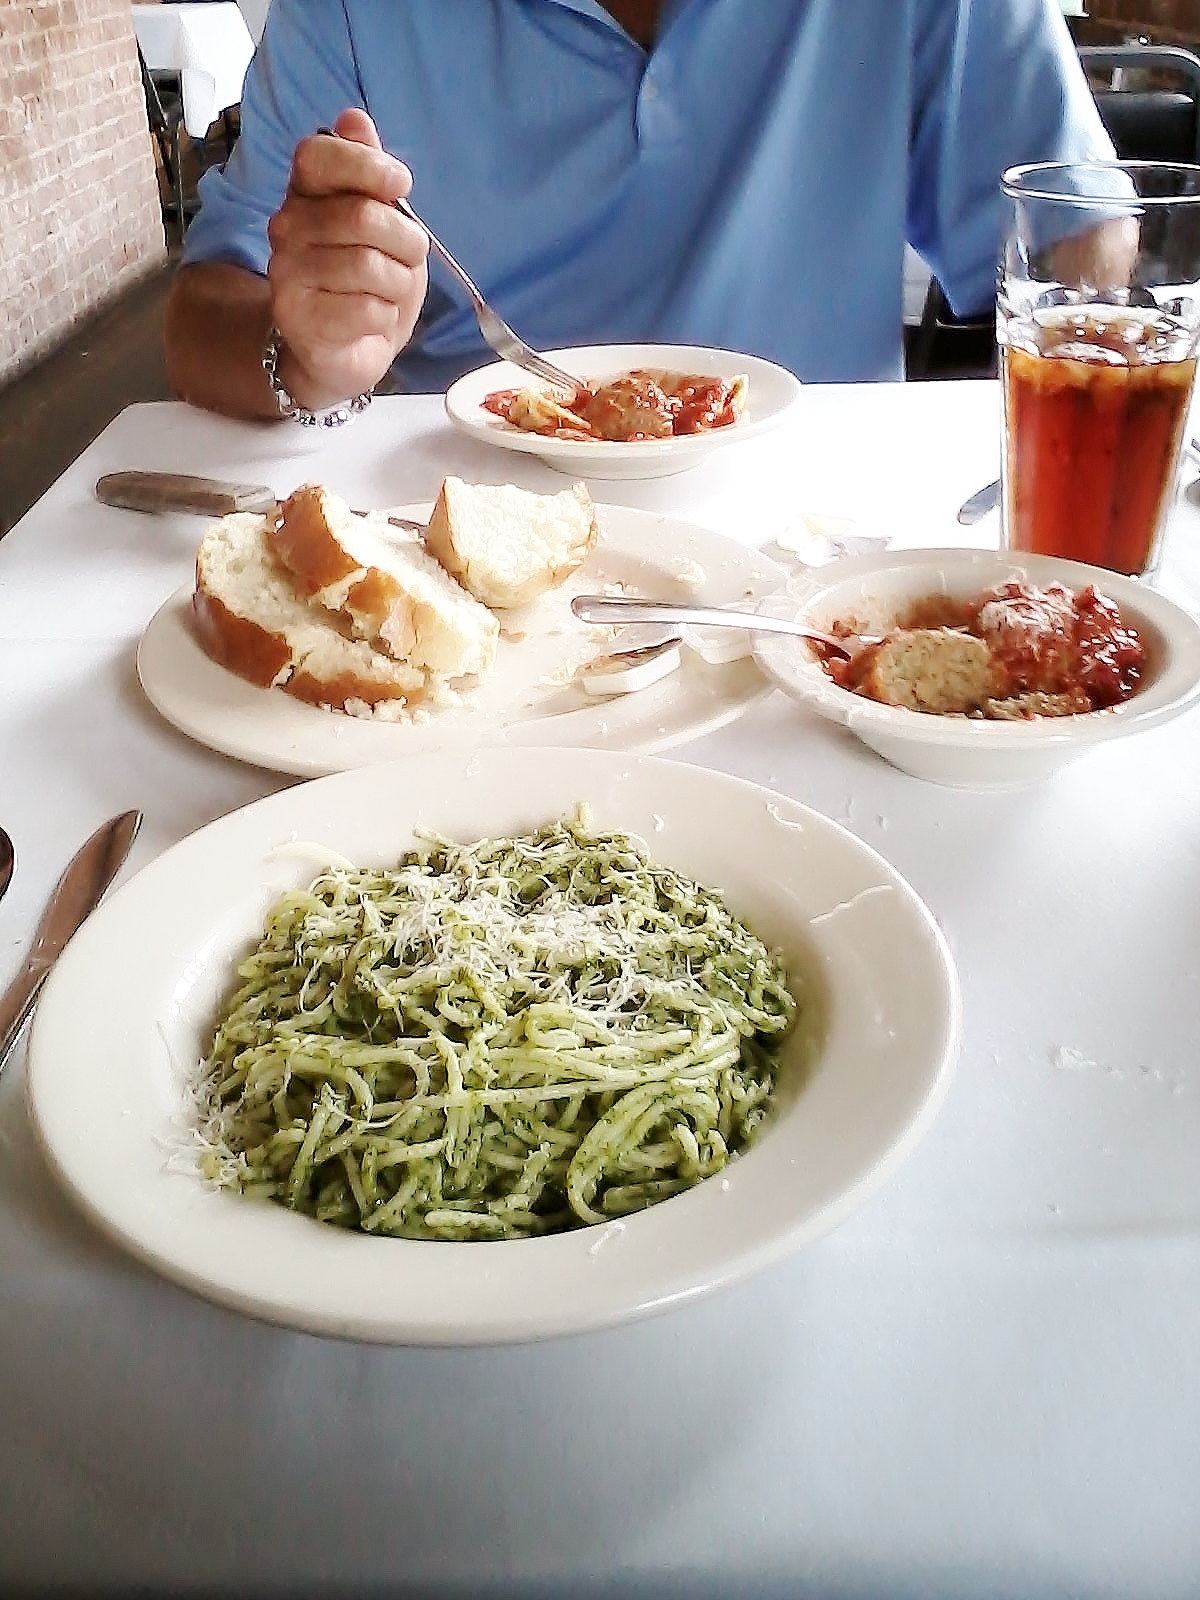 Giuseppe's Italian Restaurant/Kelli's Retro Kitchen Arts